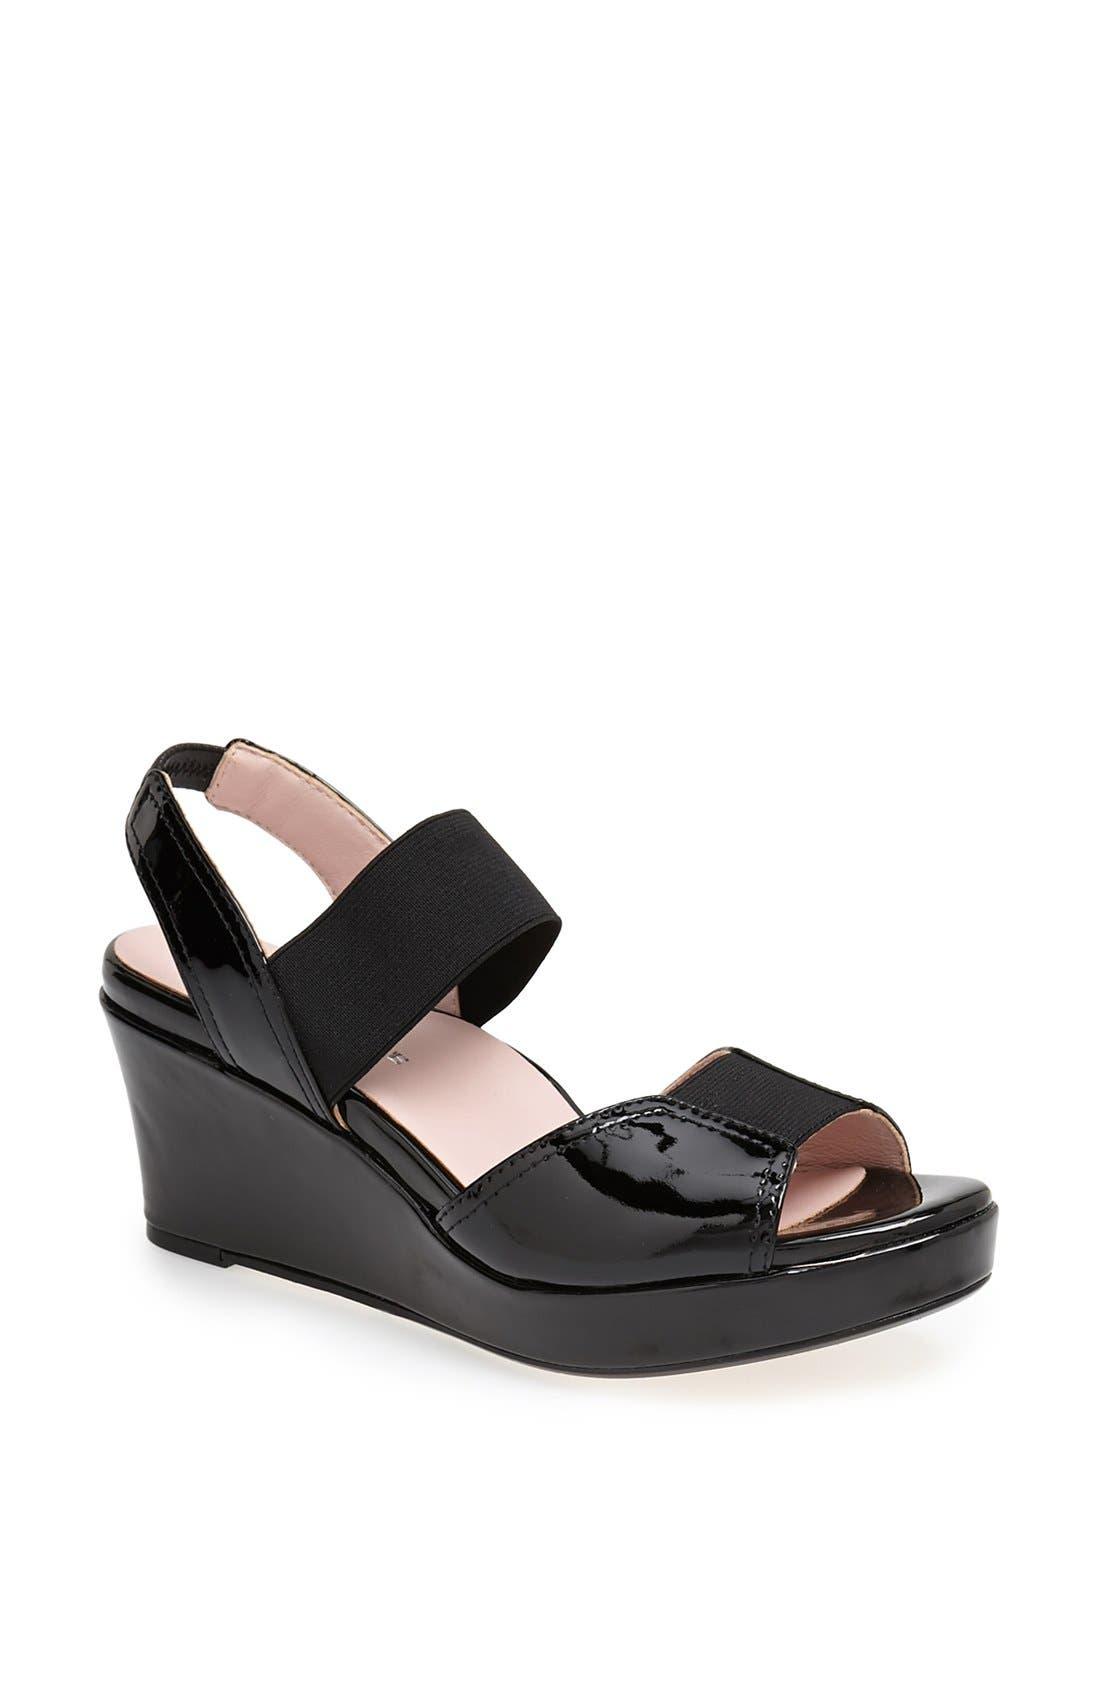 Alternate Image 1 Selected - Taryn Rose 'Sinai' Wedge Sandal